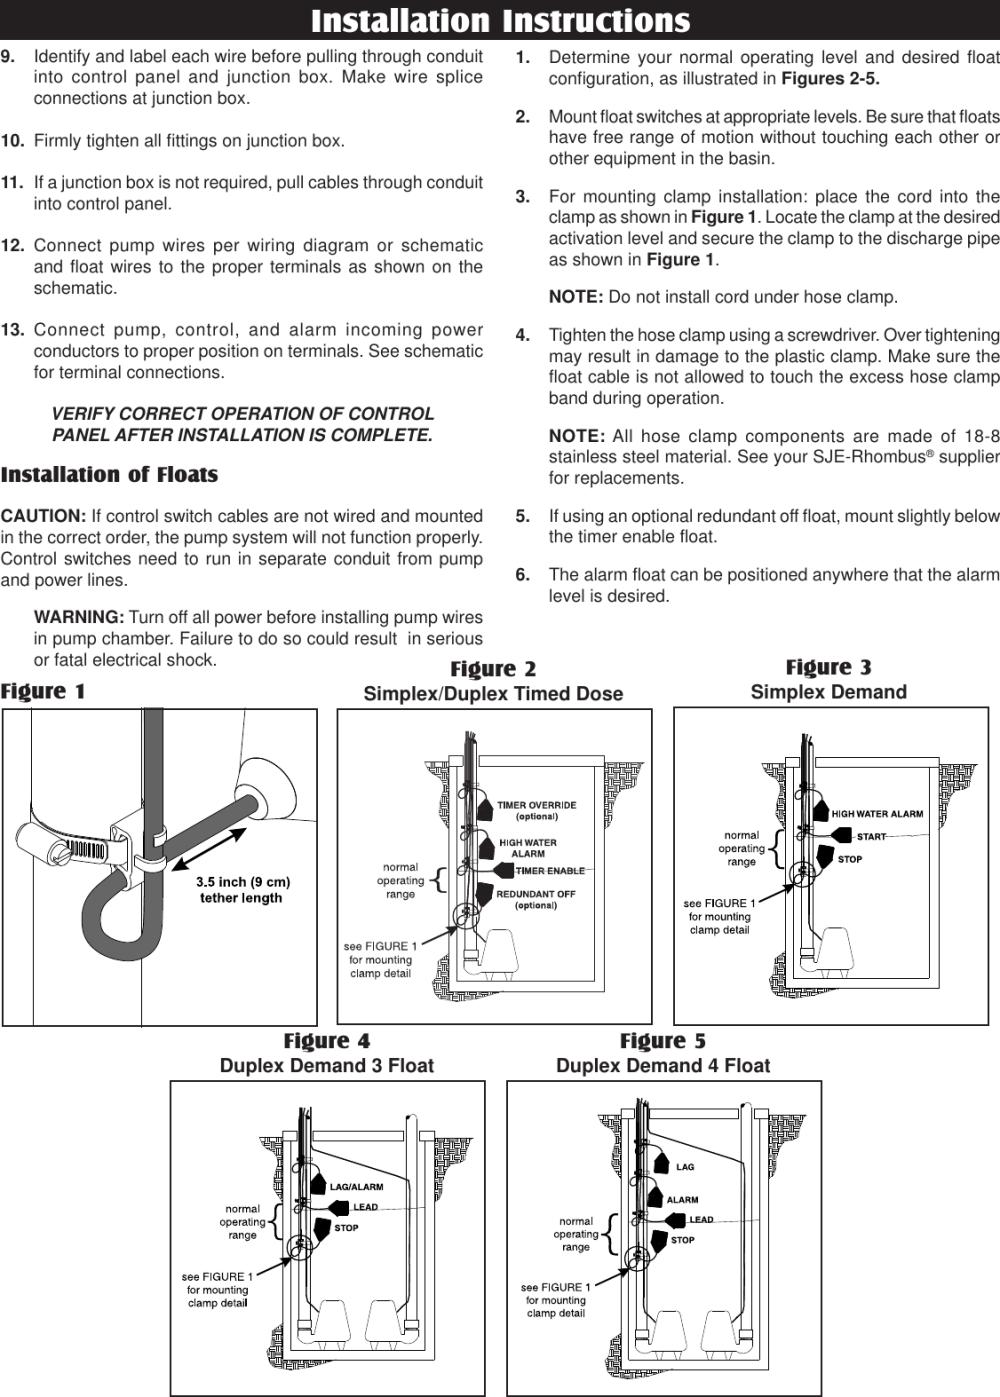 medium resolution of 1022888d ifs38 5x11 551175 1 sje rhombus ifs single phase duplex installation instructions